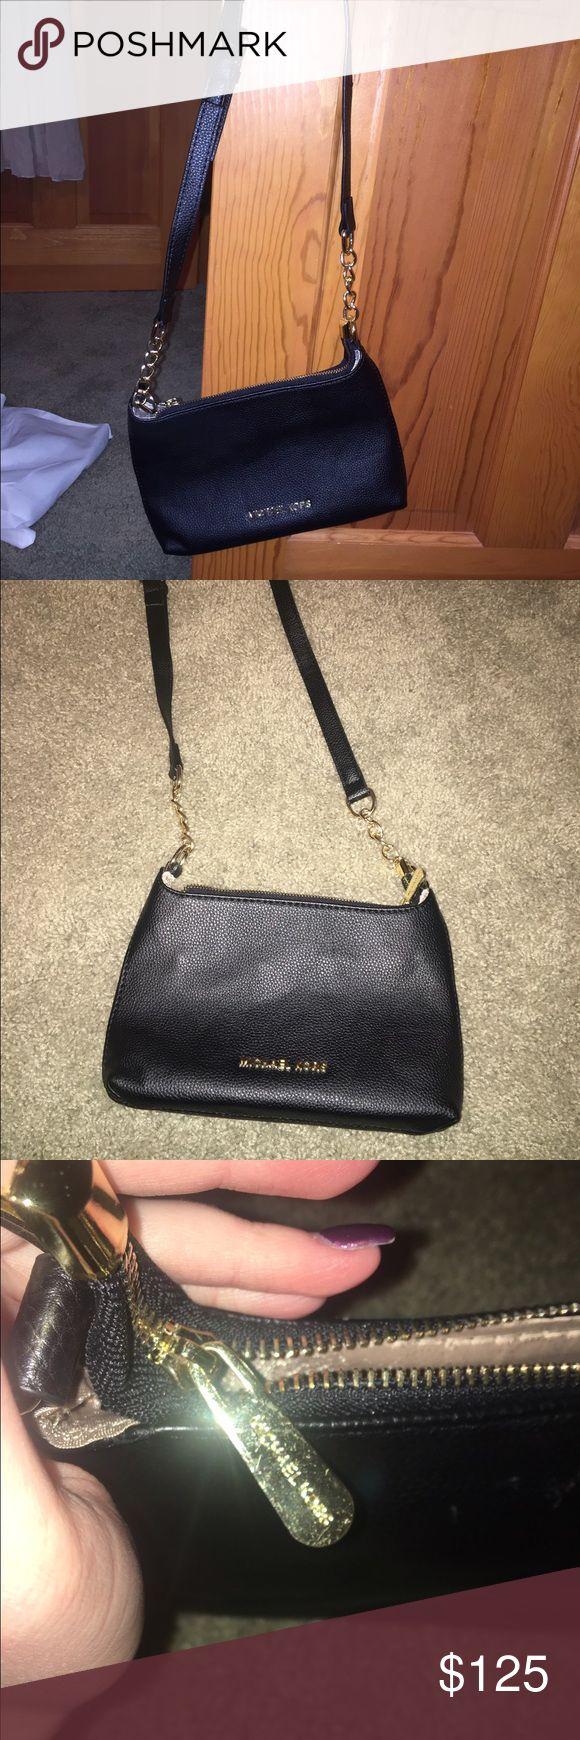 Michael Kors Black Purse Never used black Michael Kors purse in amazing condition 😊 Michael Kors Bags Crossbody Bags